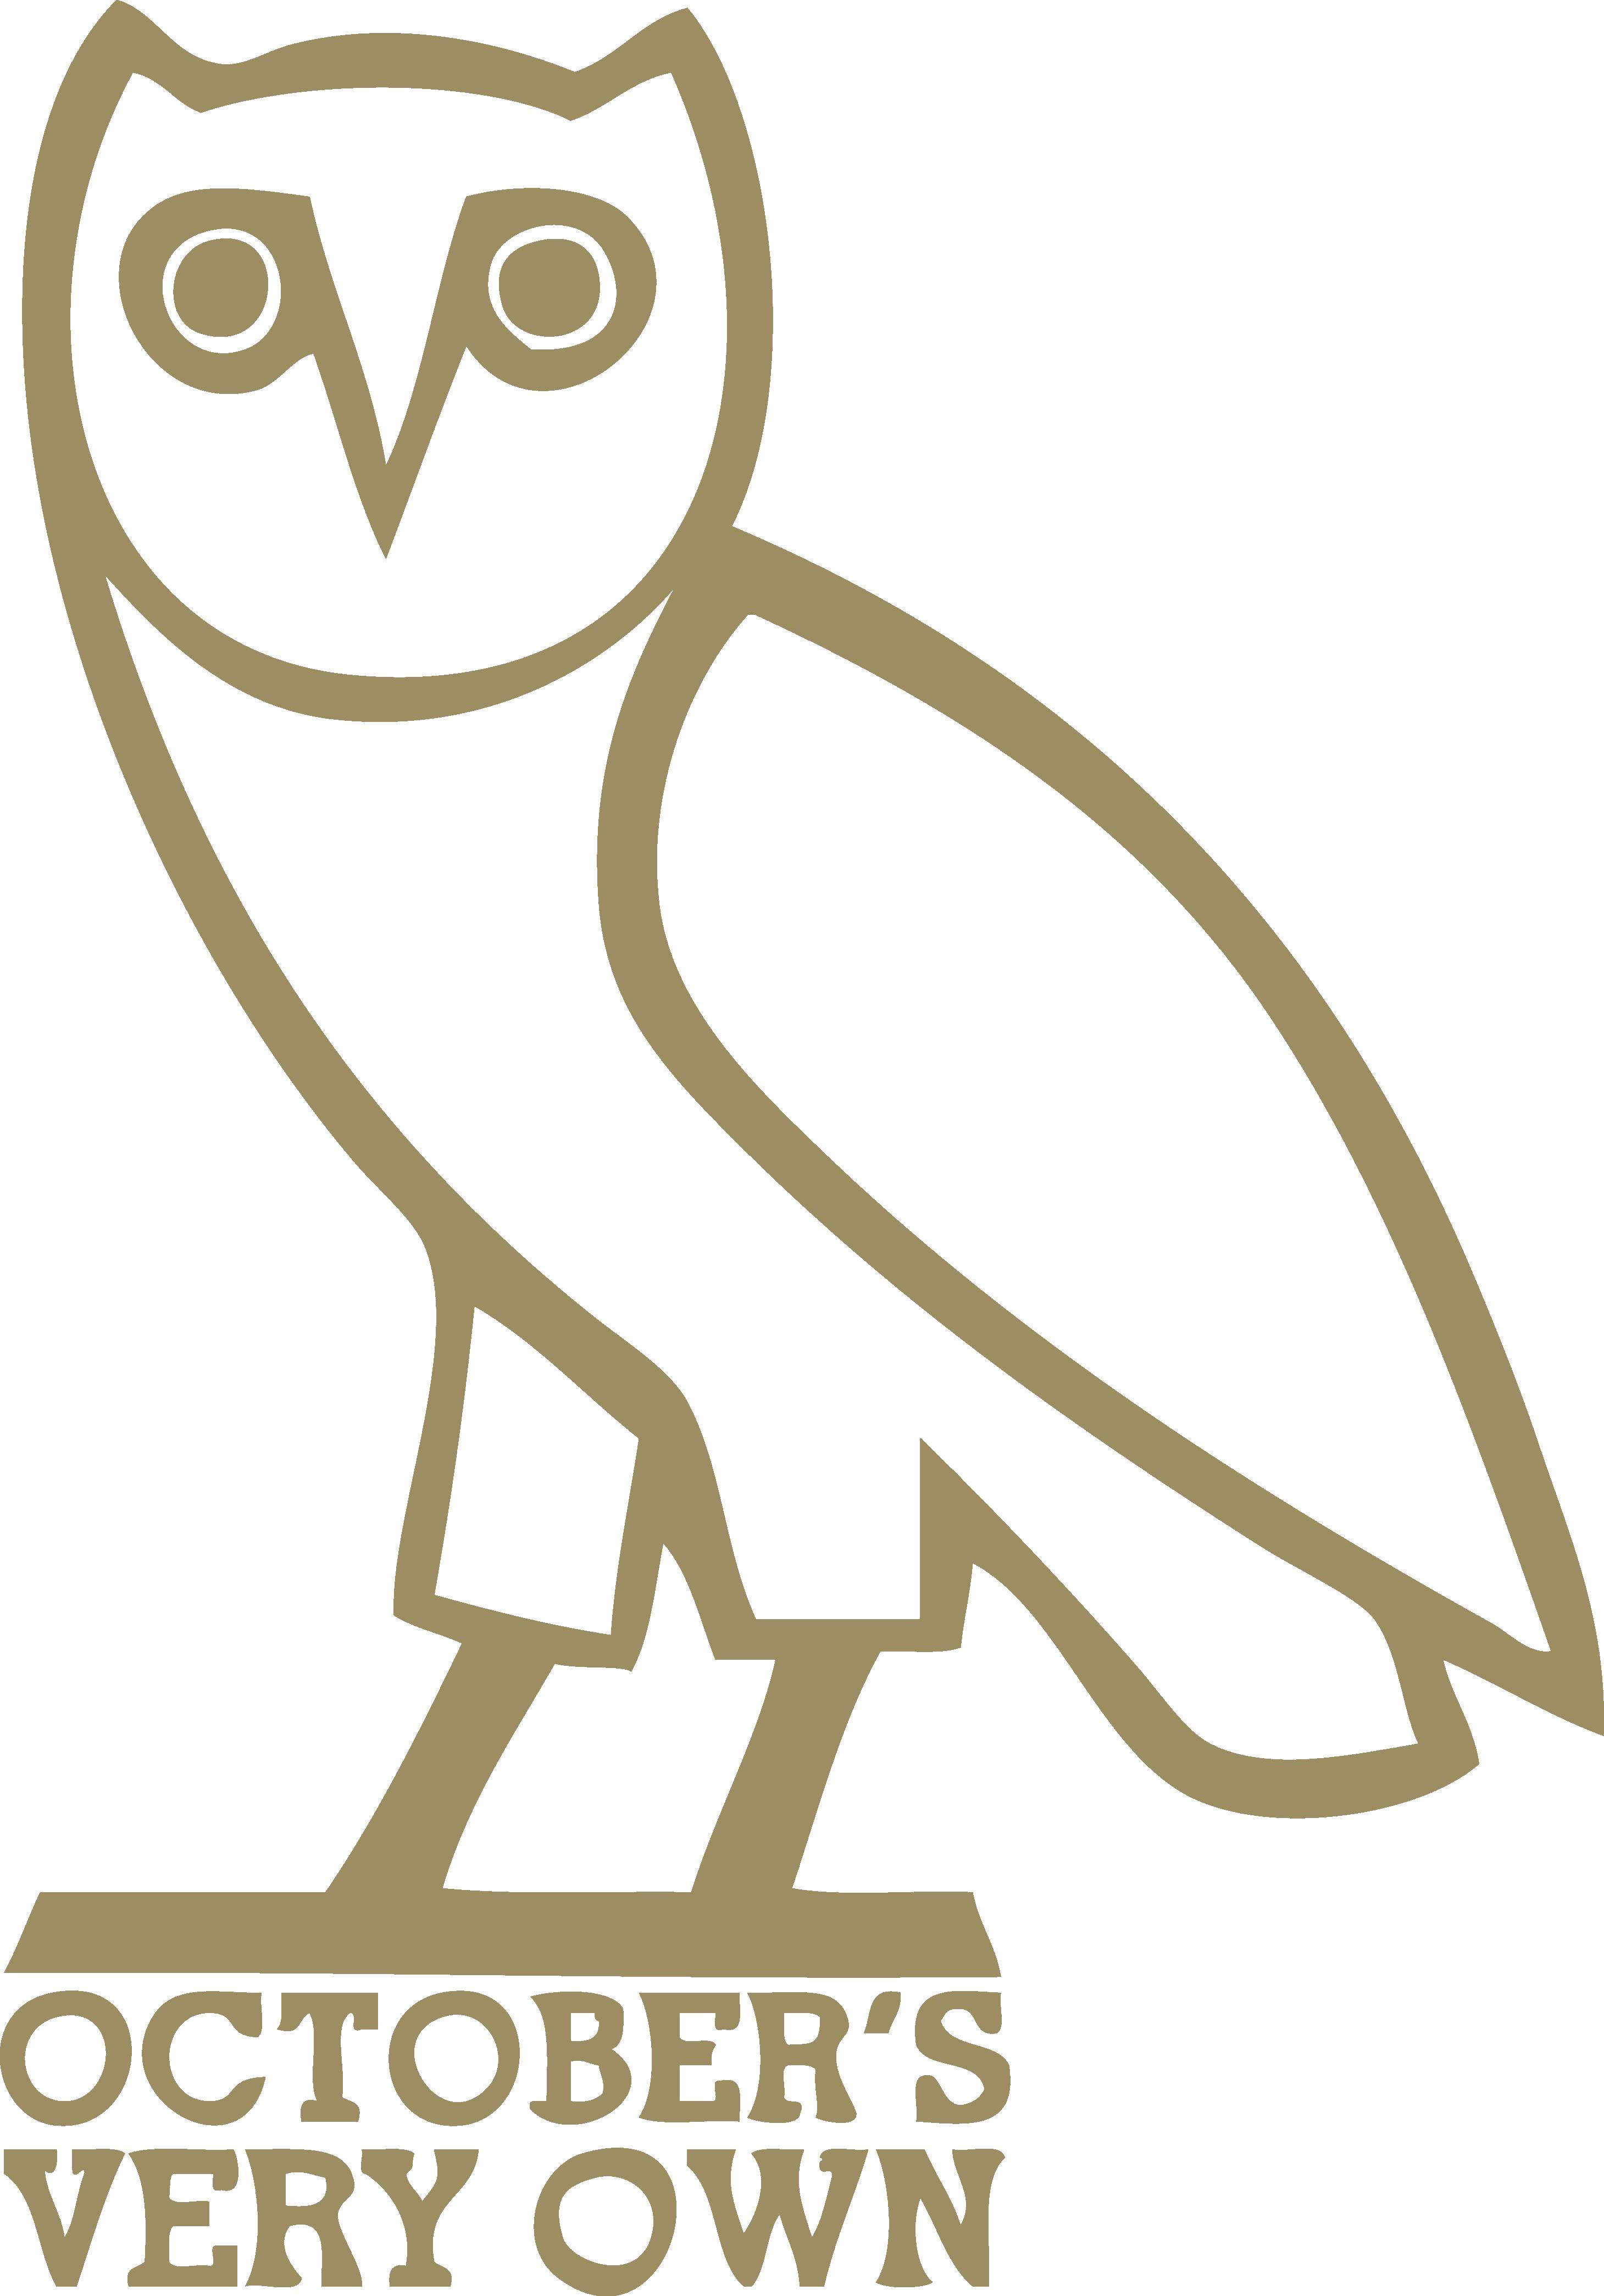 ovo owl wallpaper wallpapersafari